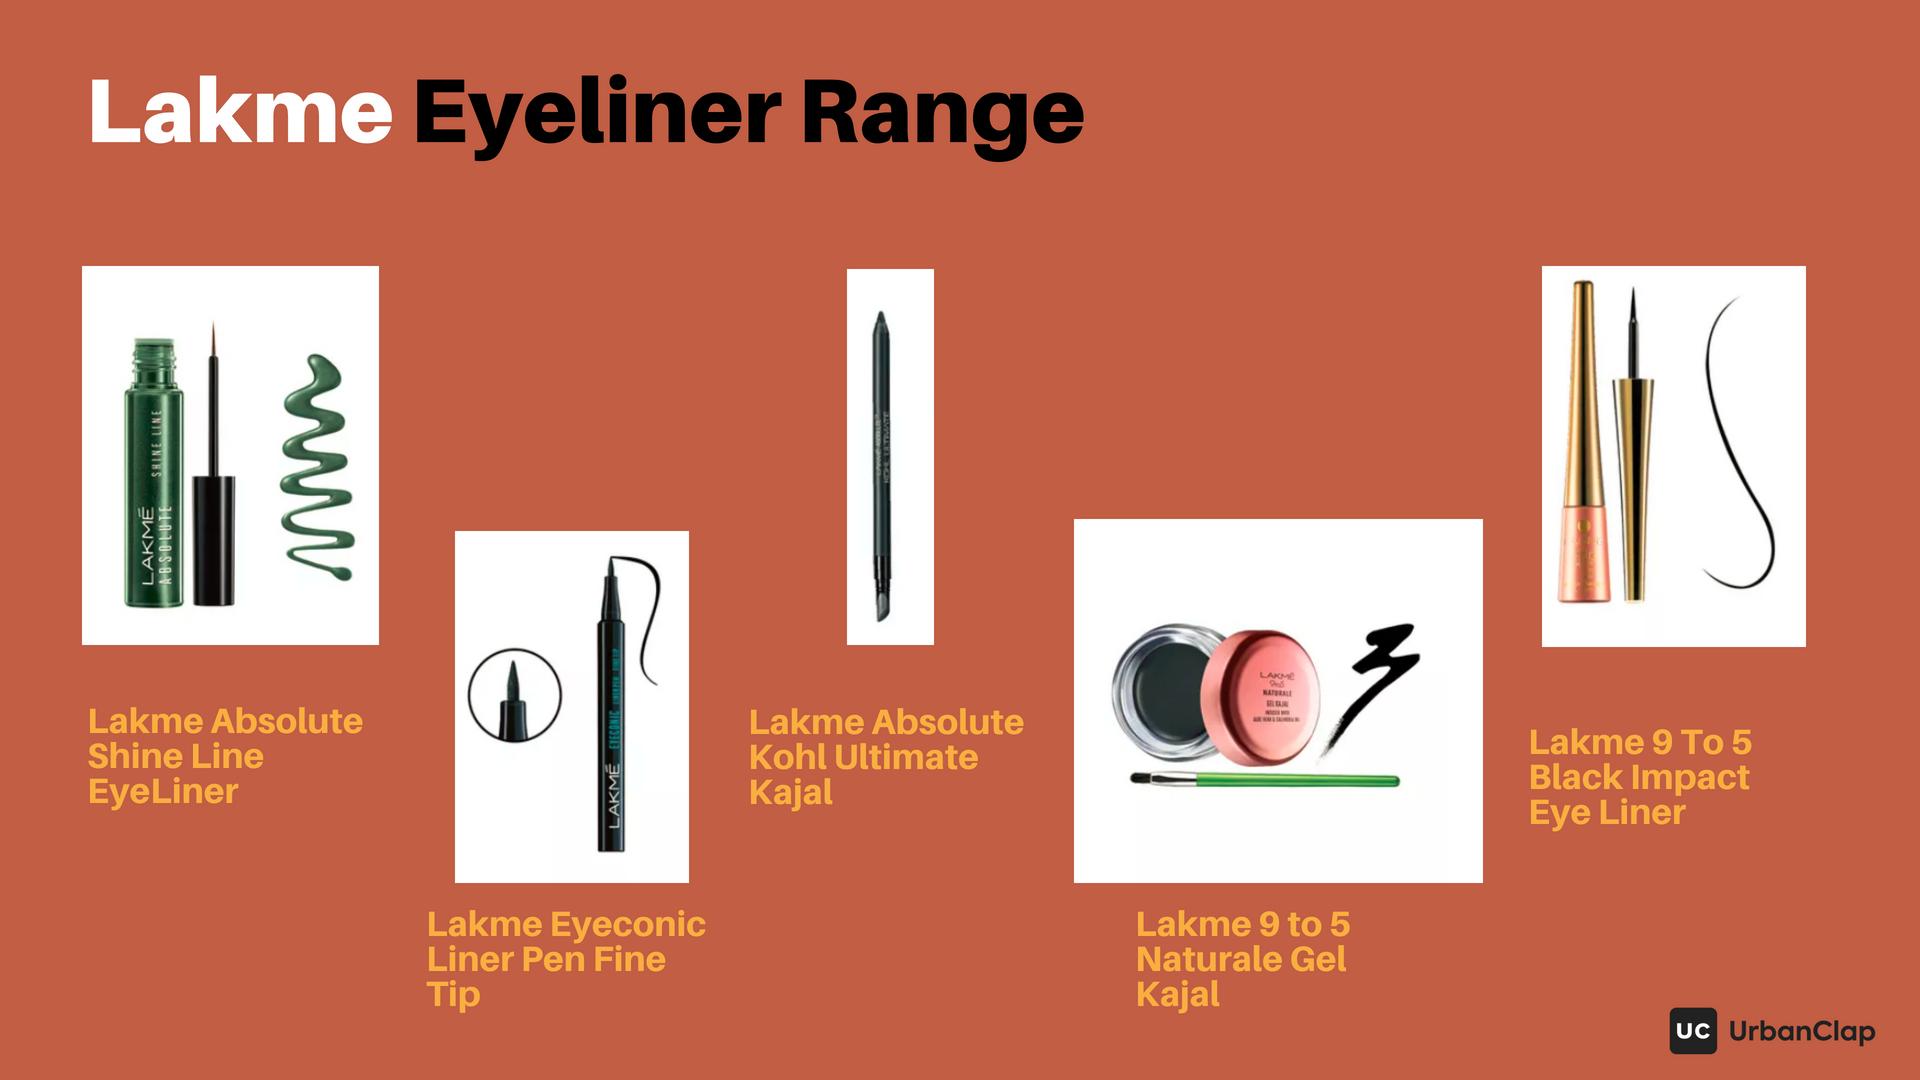 Lakme Eyeliner Range - liquid eyeliner and gel eyeliners